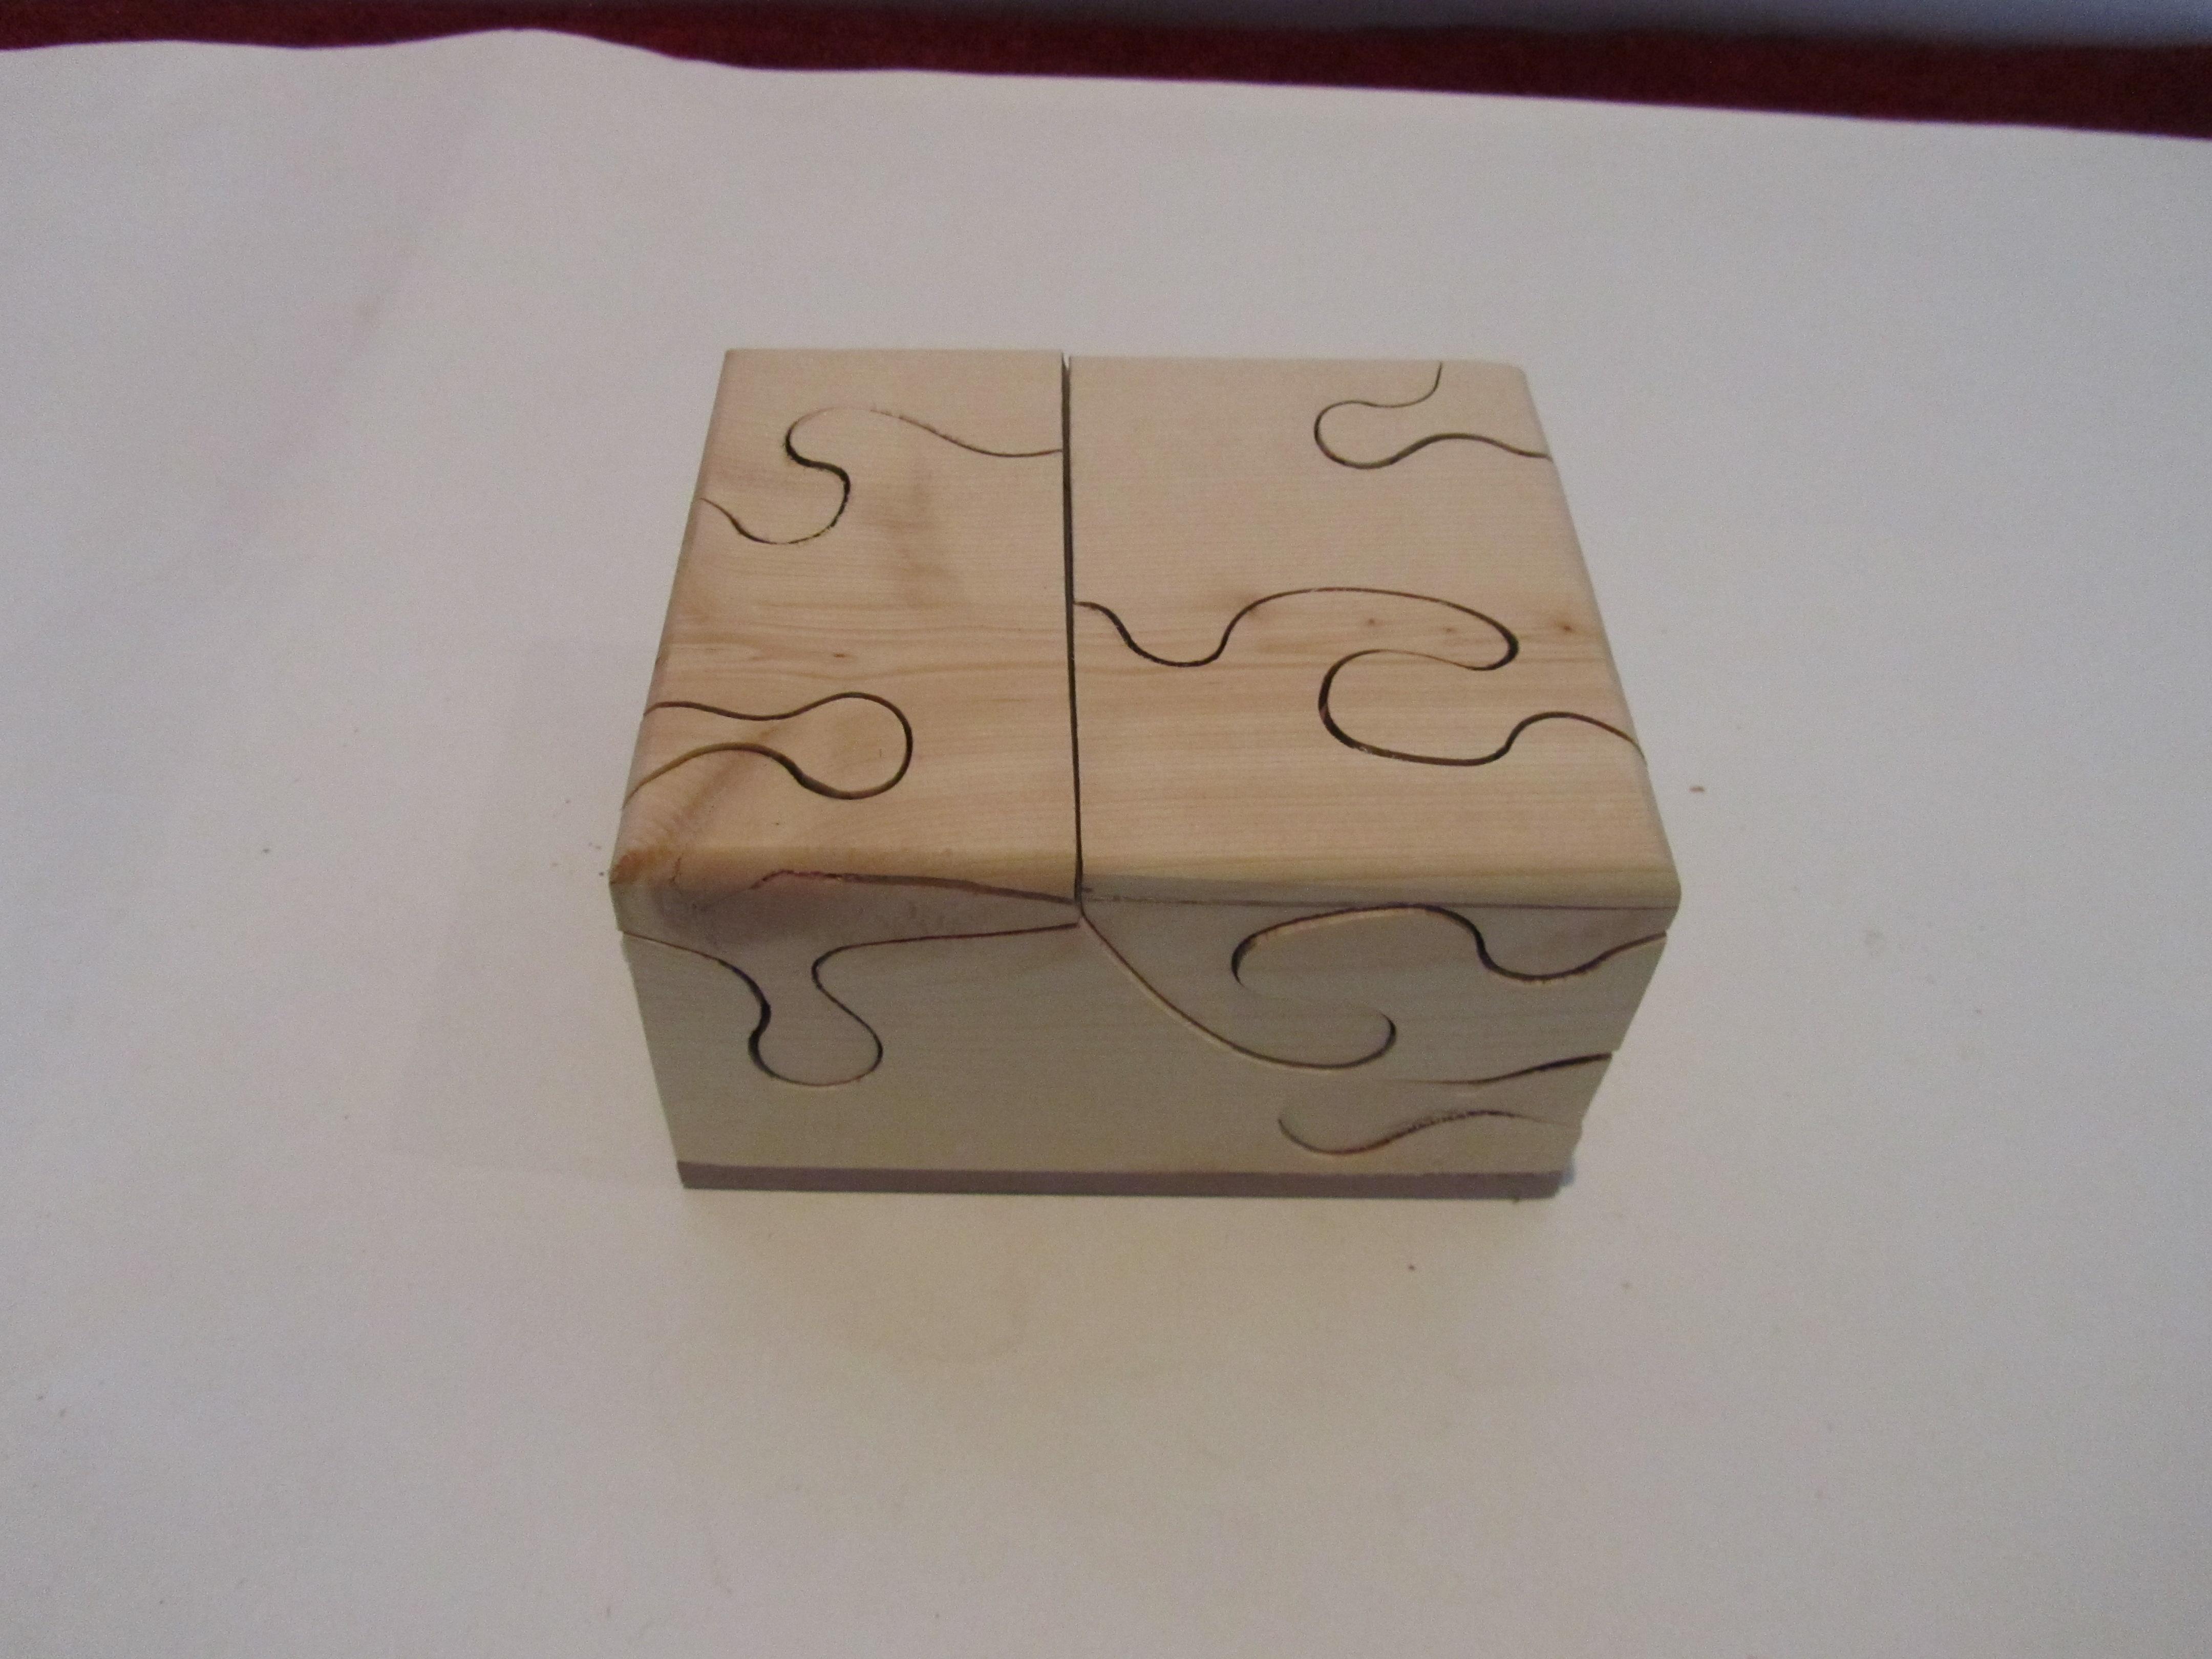 SOLD PB#288 Big Puzzle $40